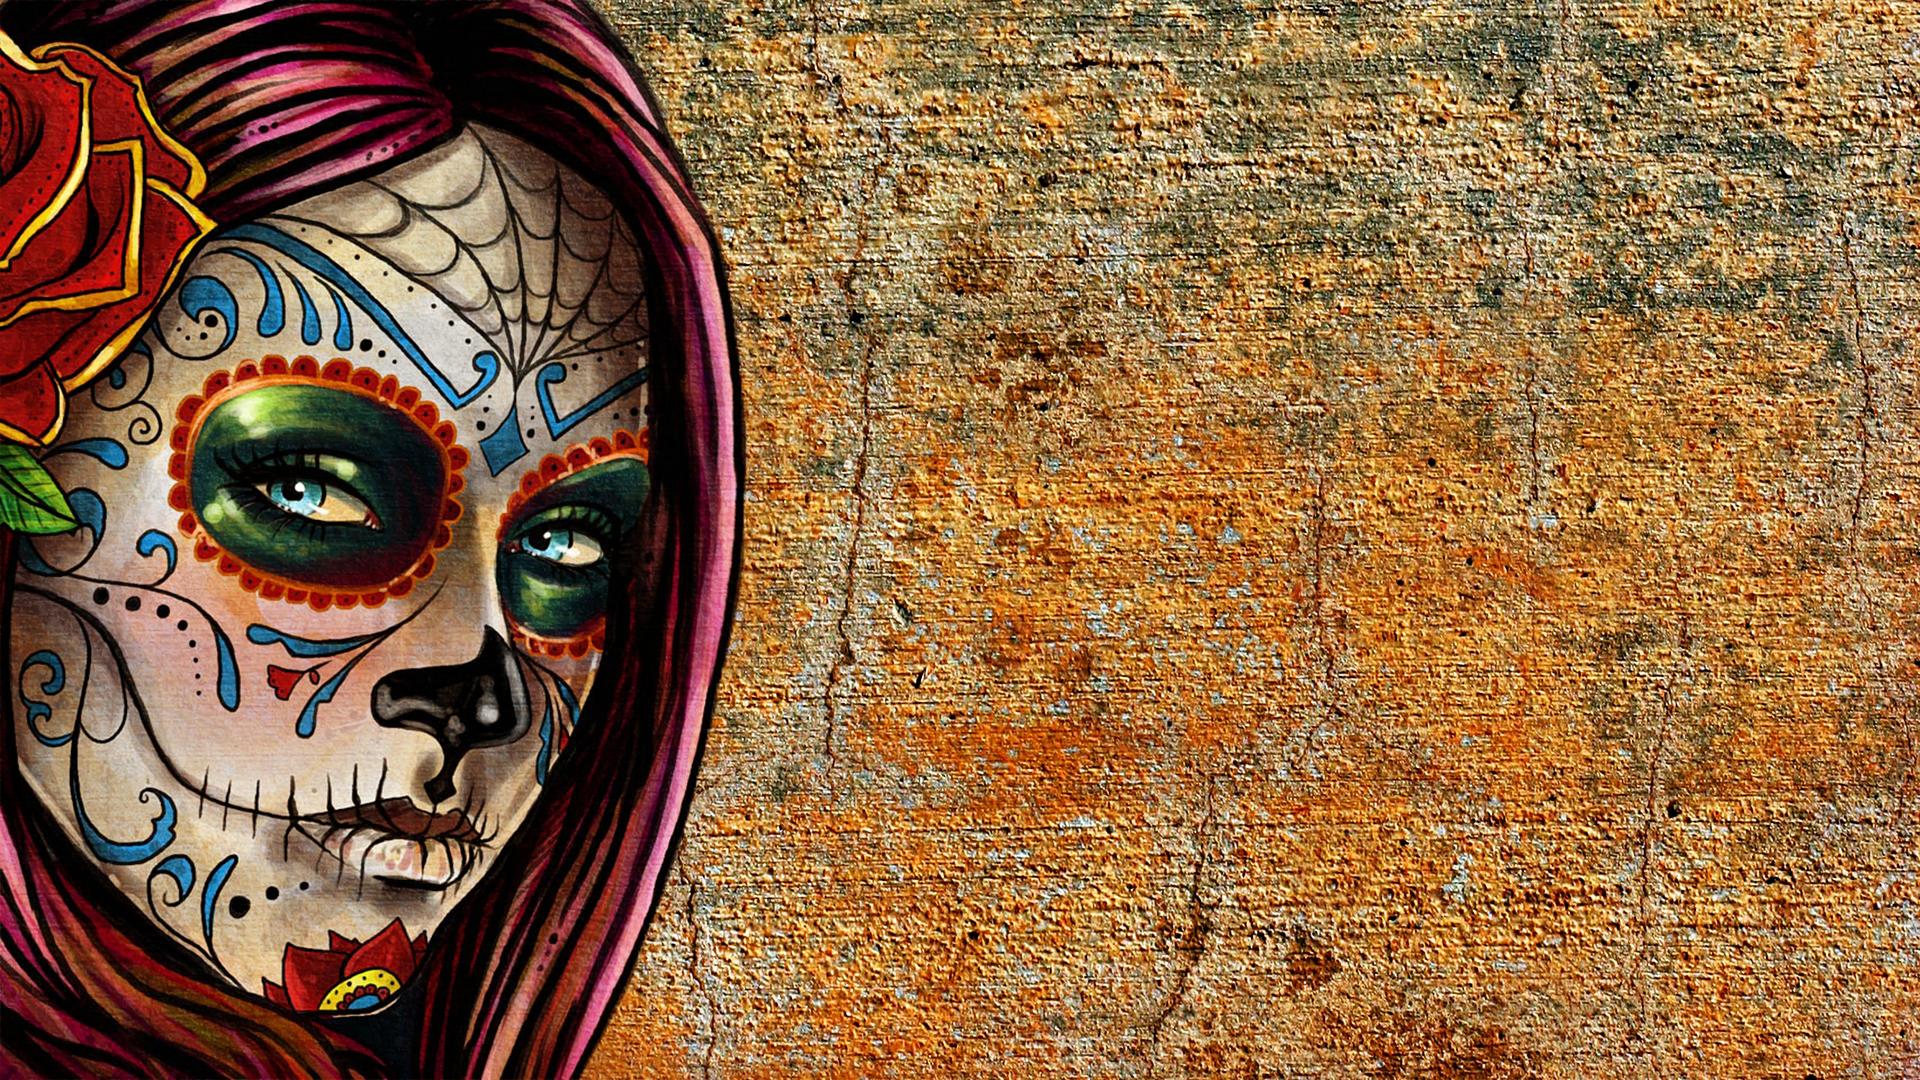 Sugar Skull Computer Wallpapers Desktop Backgrounds 1920x1080 ID 1920x1080